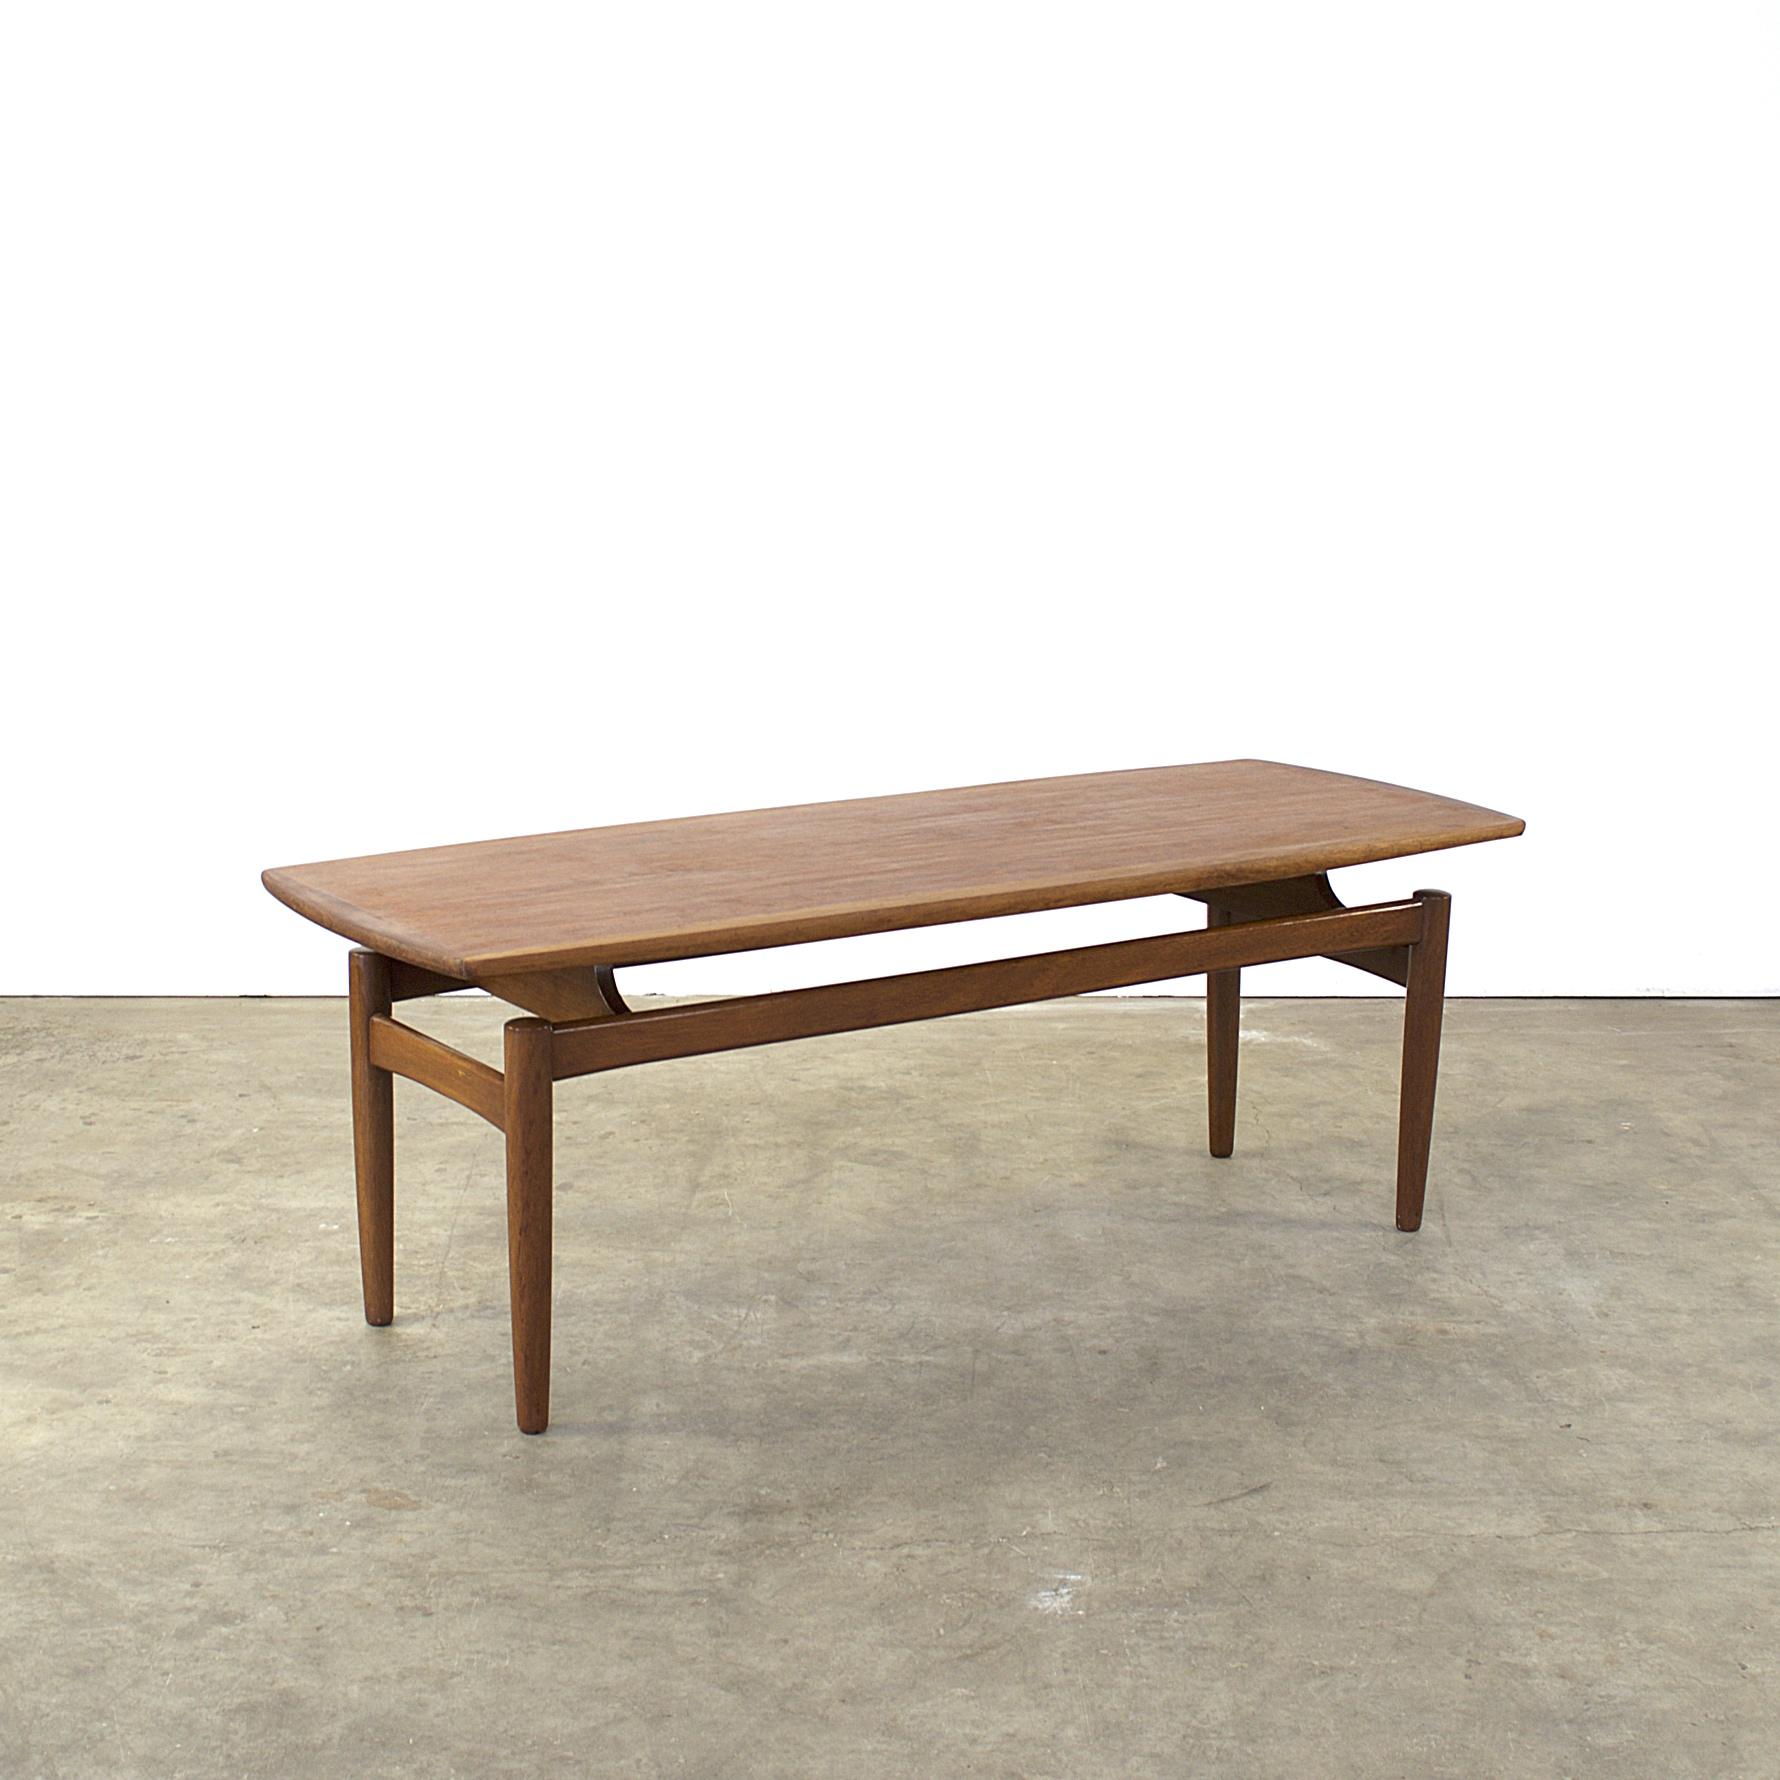 60s Coffee Table Scandinavian Design inside size 1780 X 1780